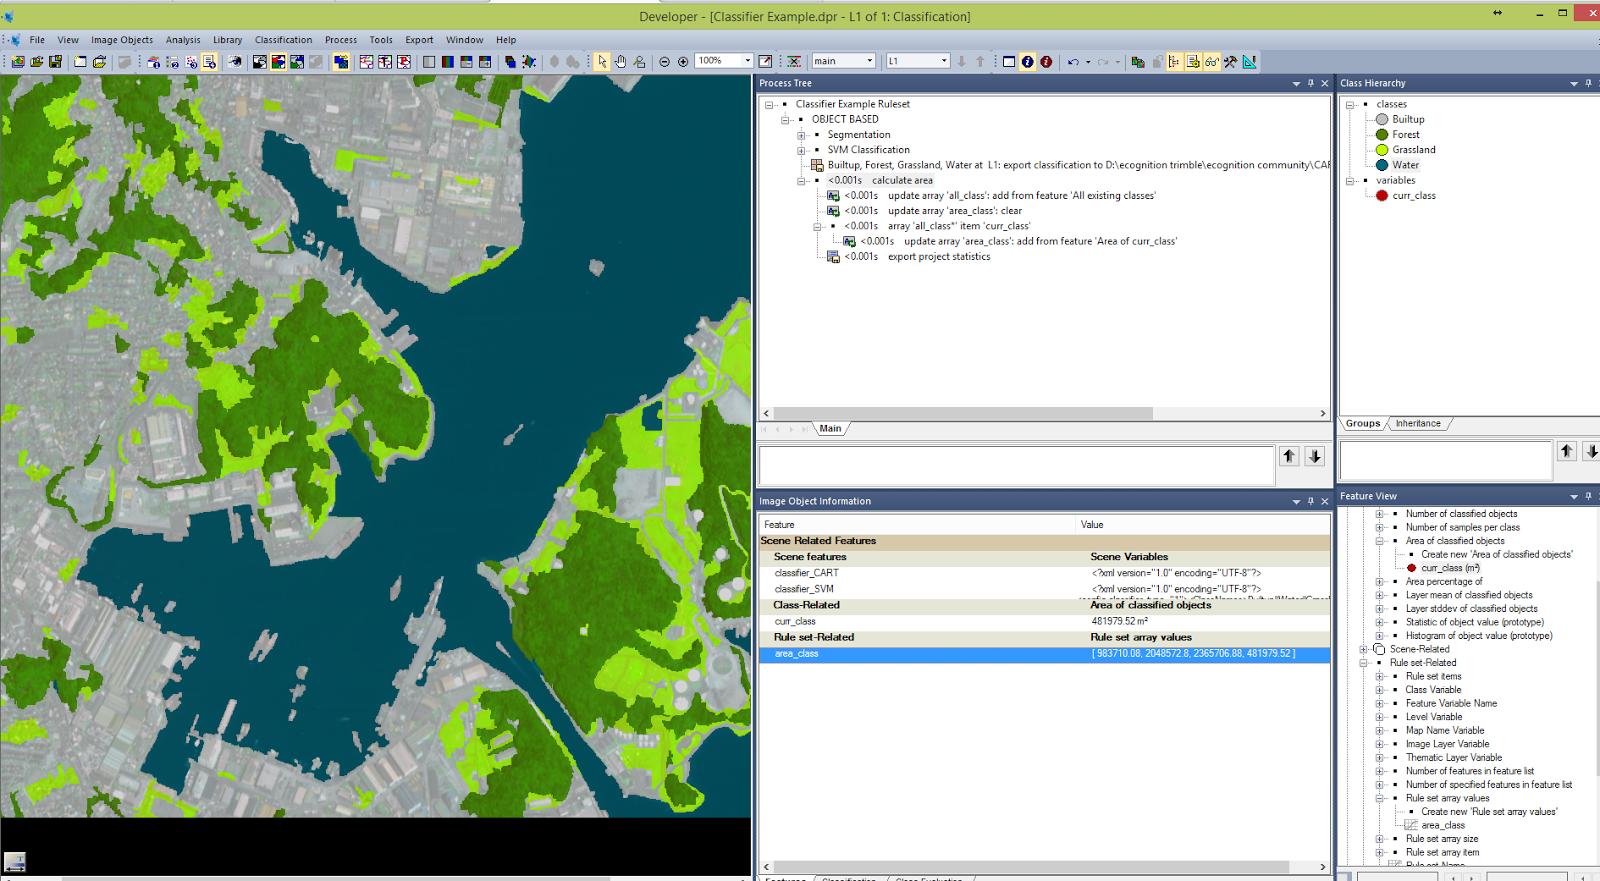 QGIS, remote sensing, Matlab, ENVI, Python, eCognition: November 2014